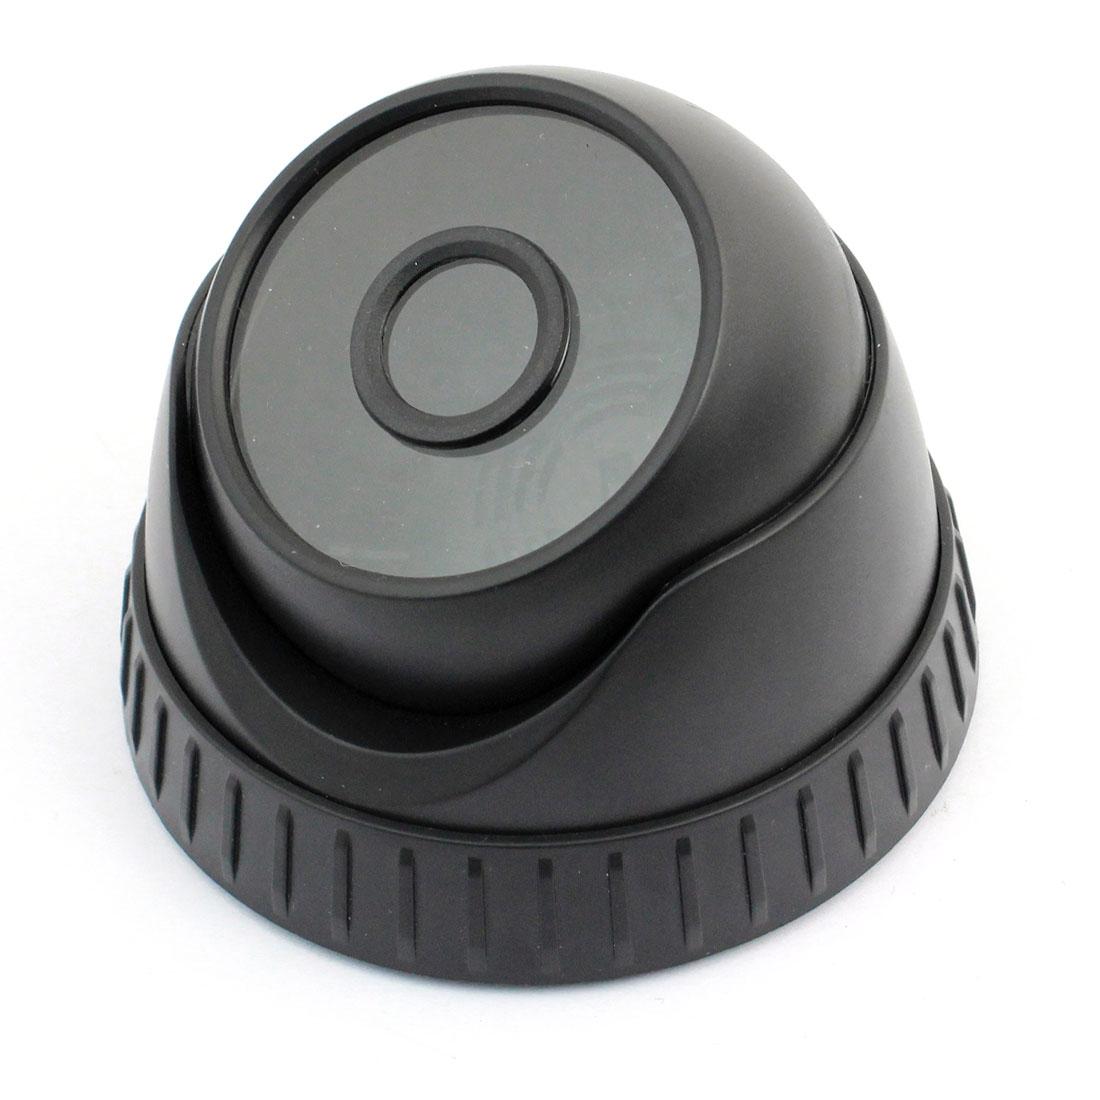 "Surveillance Black Plastic CCTV Dome Camera Housing Case 3.6"" Dia"